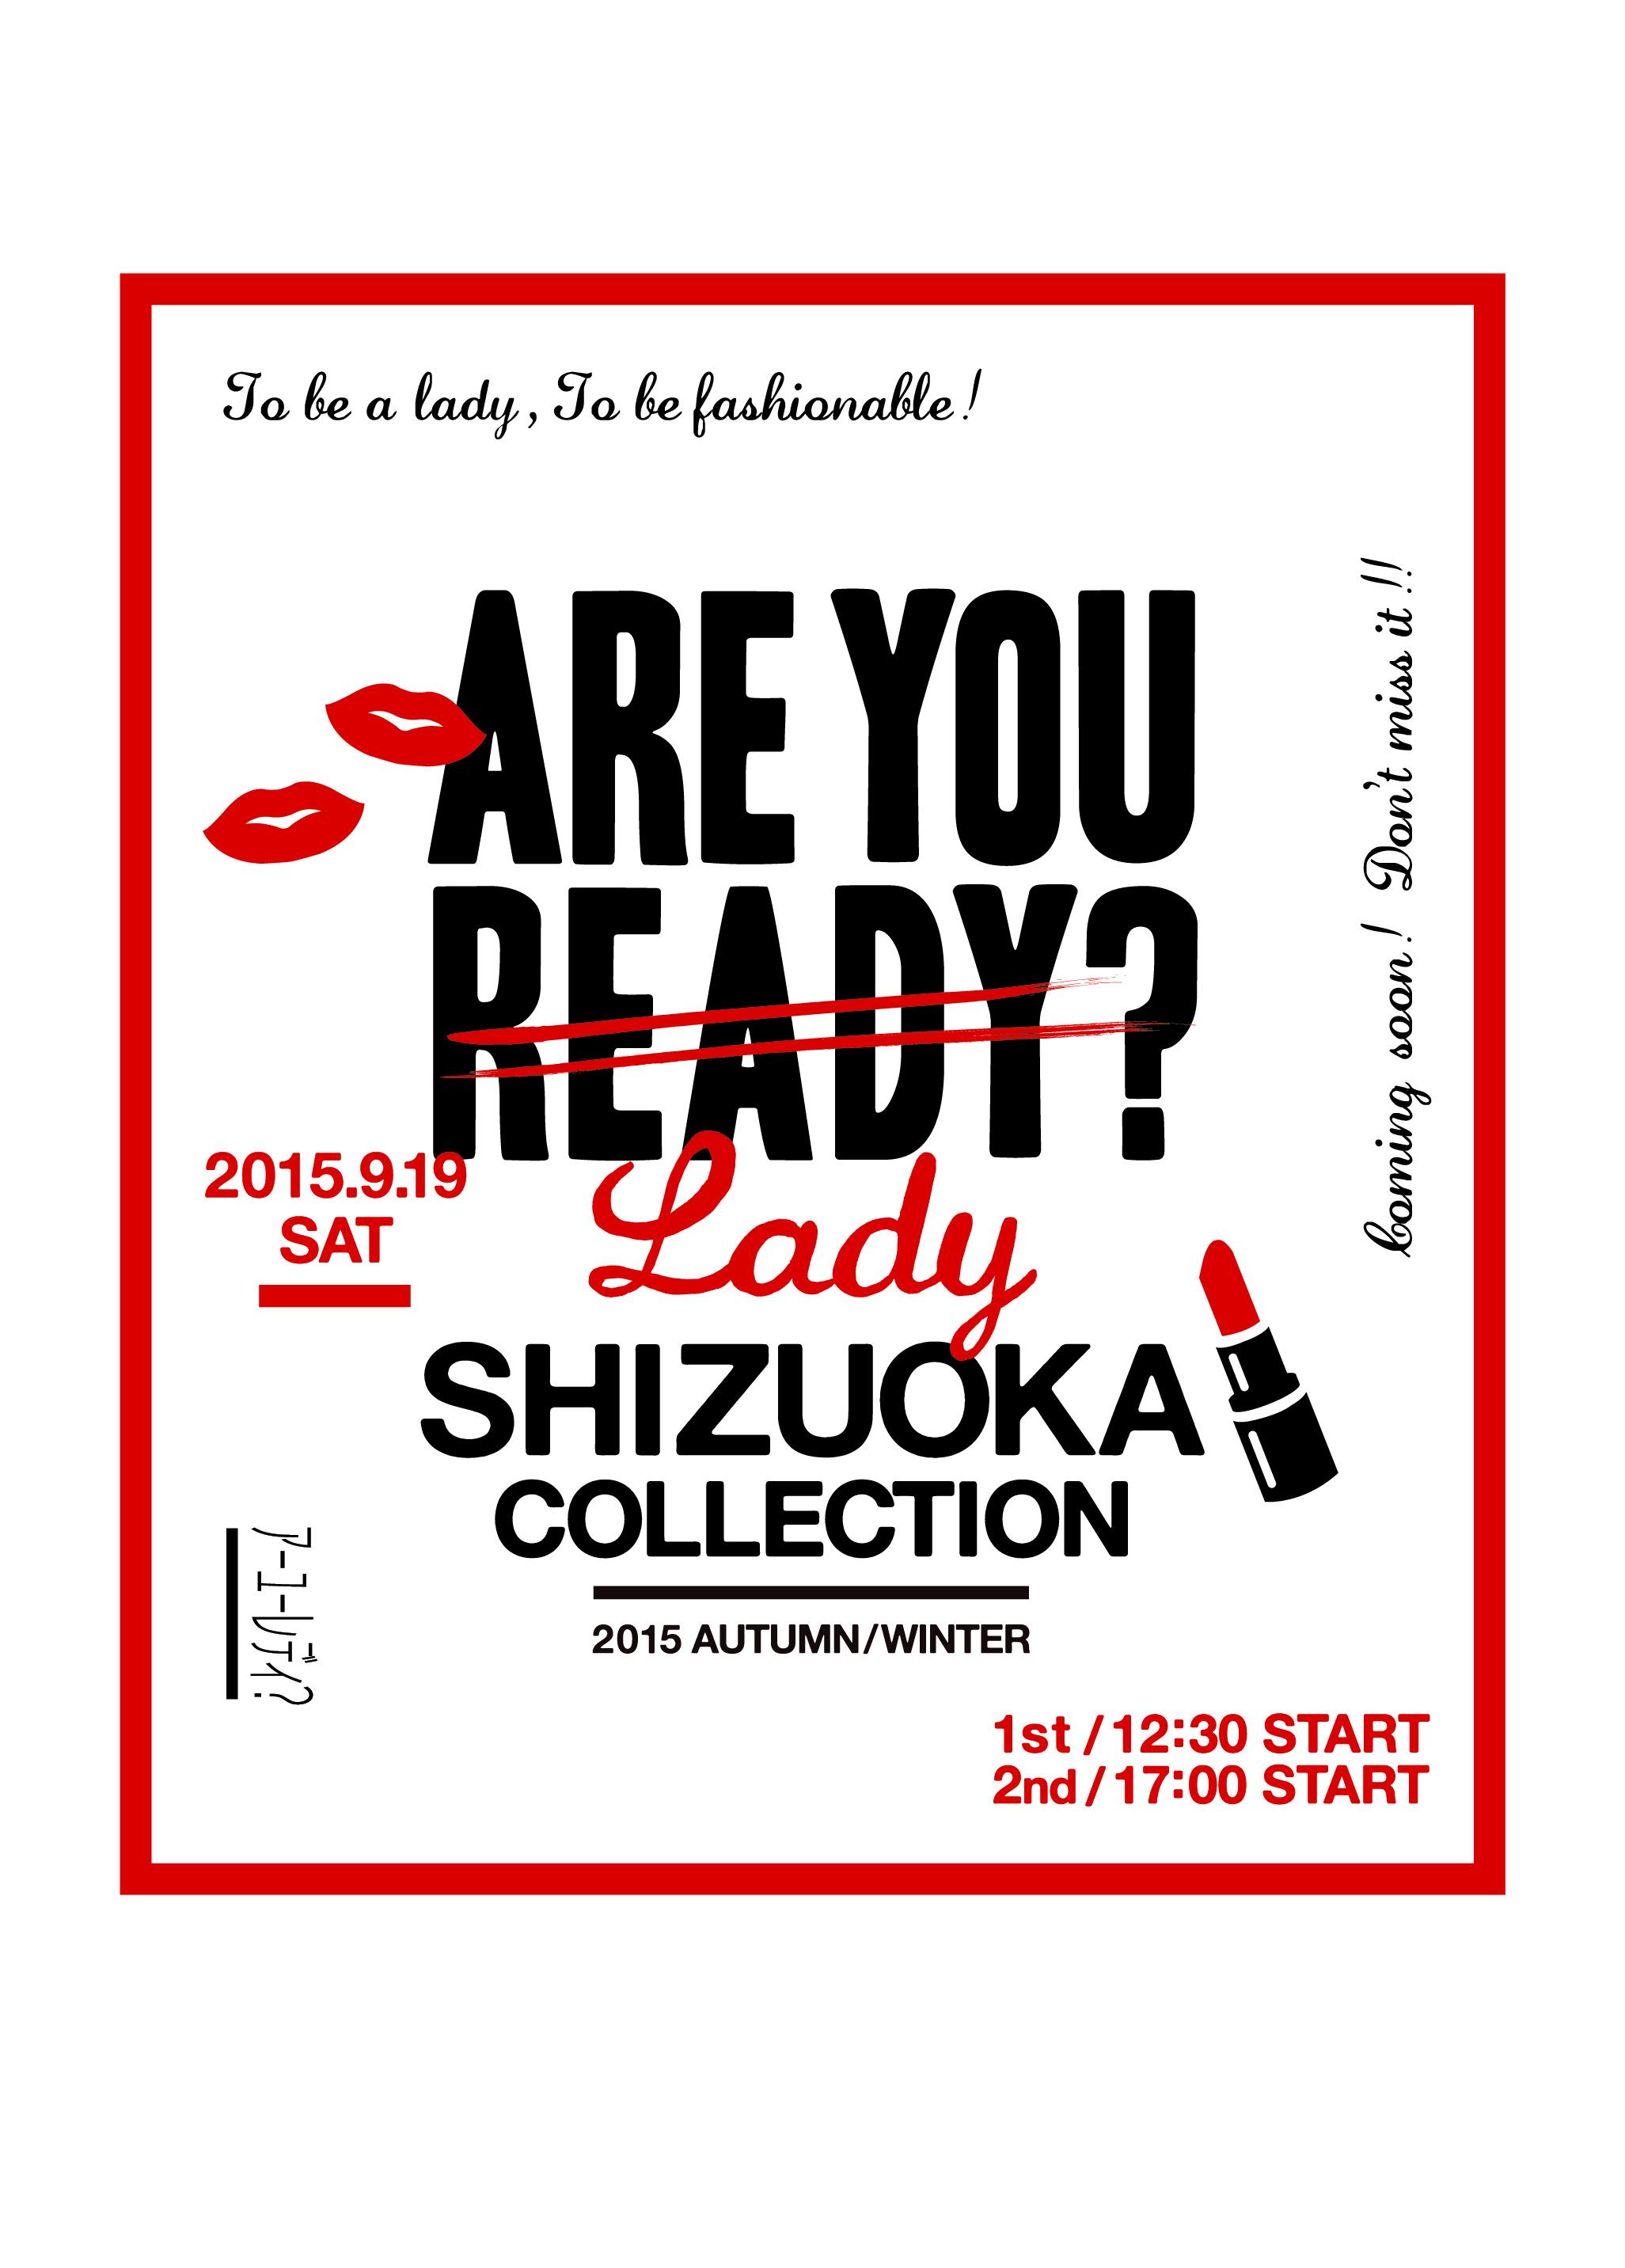 SHIZUOKA COLLECTION 2015 AUTUMN / WINTER 2nd